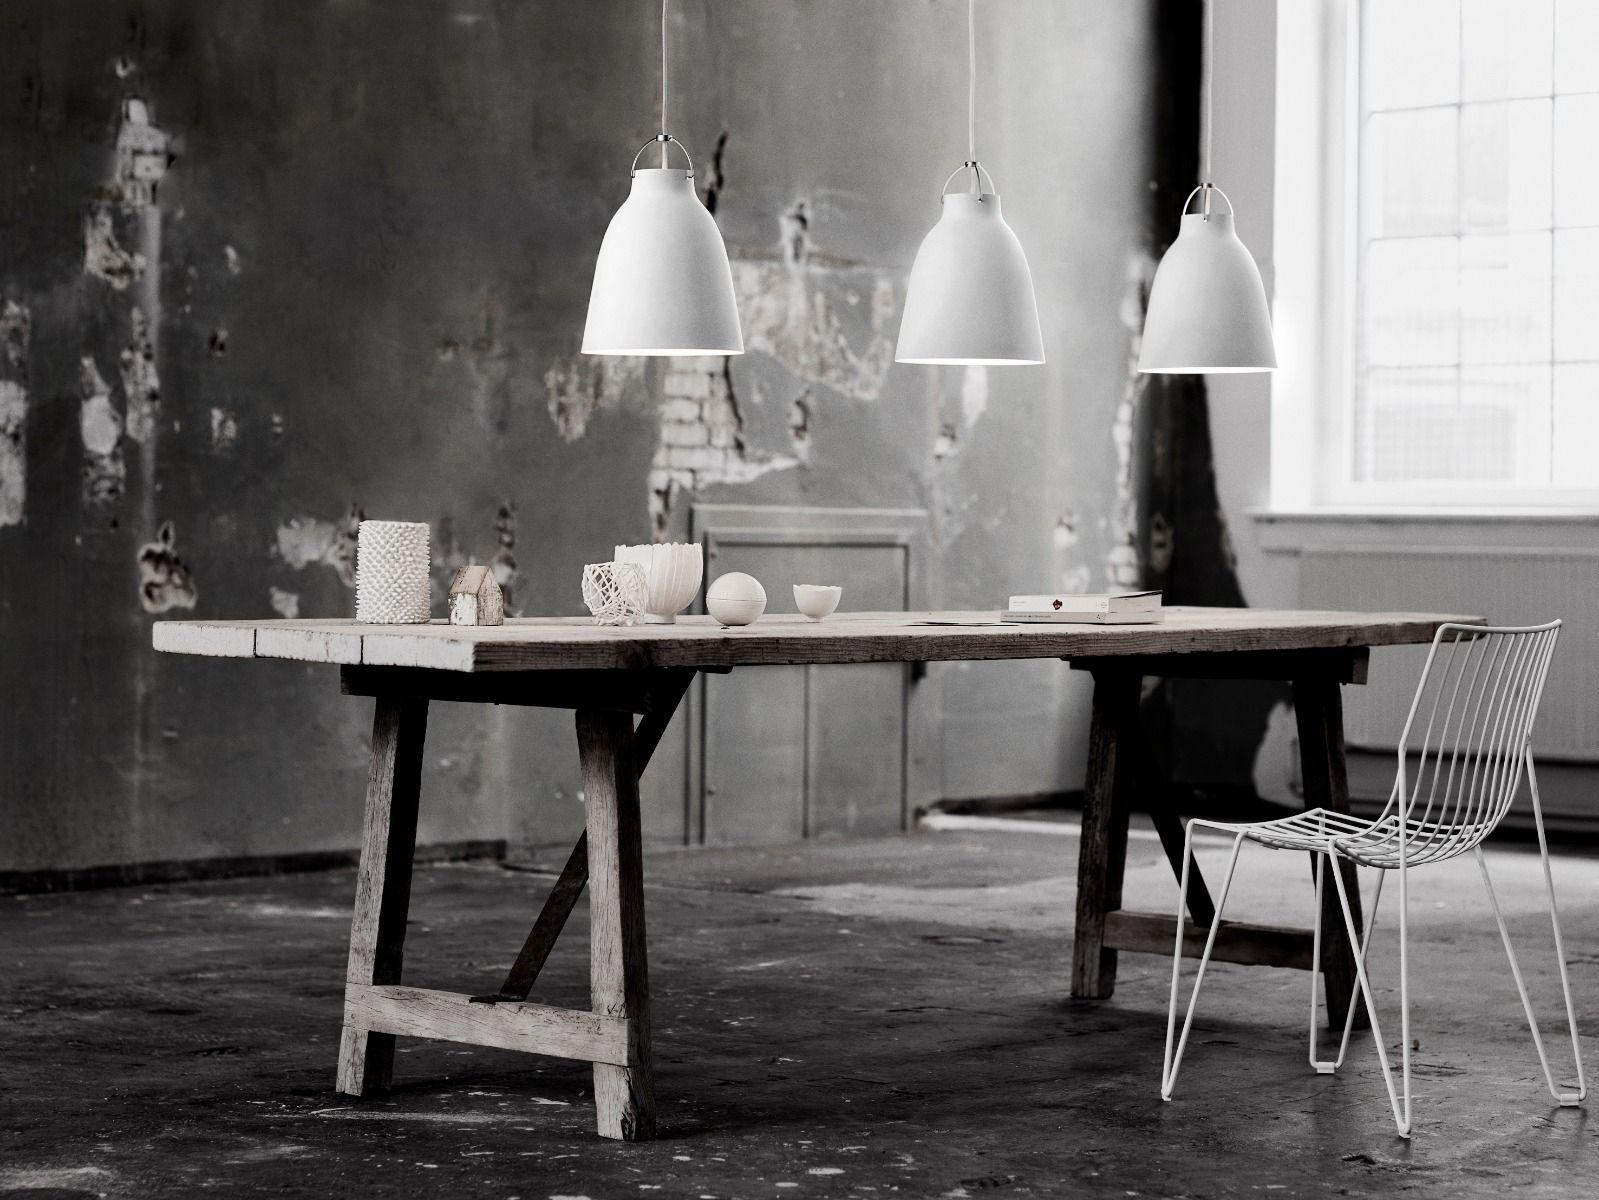 fritz hansen caravaggio pendant light matt white three hanging over a table